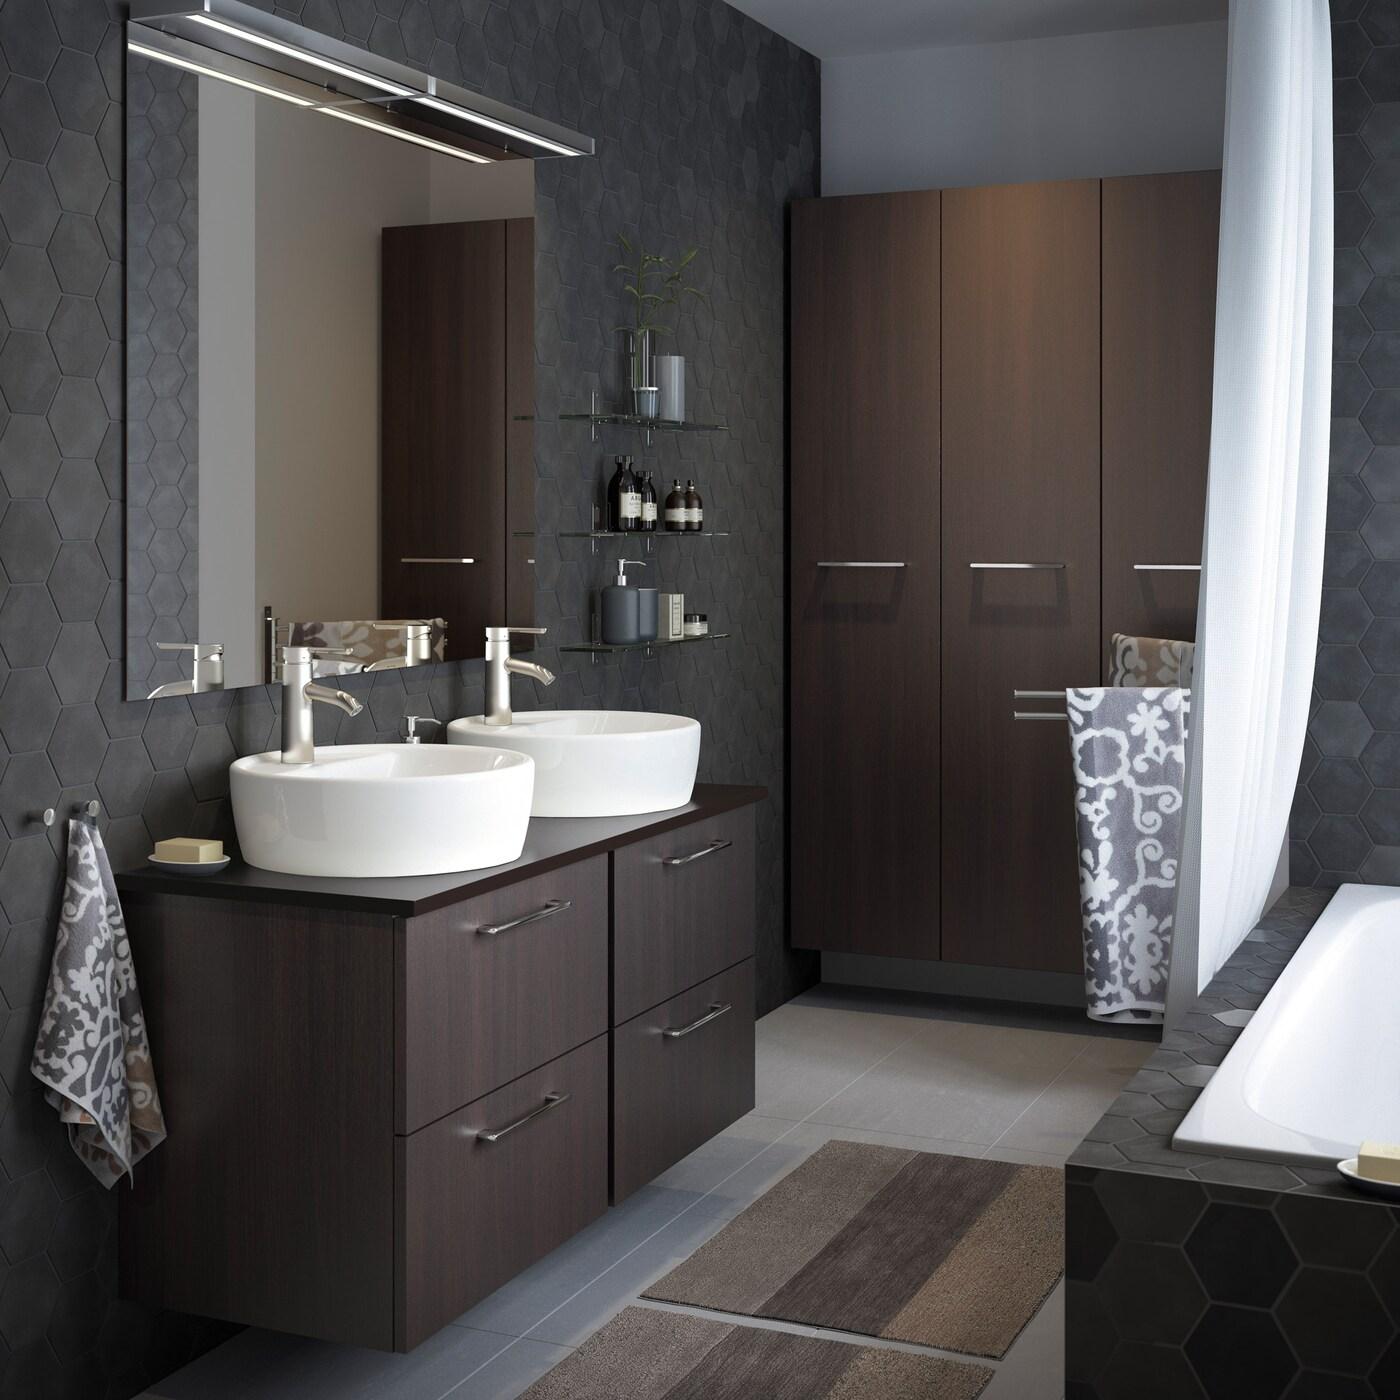 Ikea Mobili Bagno Pensili https://www.ikea/it/it/rooms/kitchen/gallery/adatta-tuo